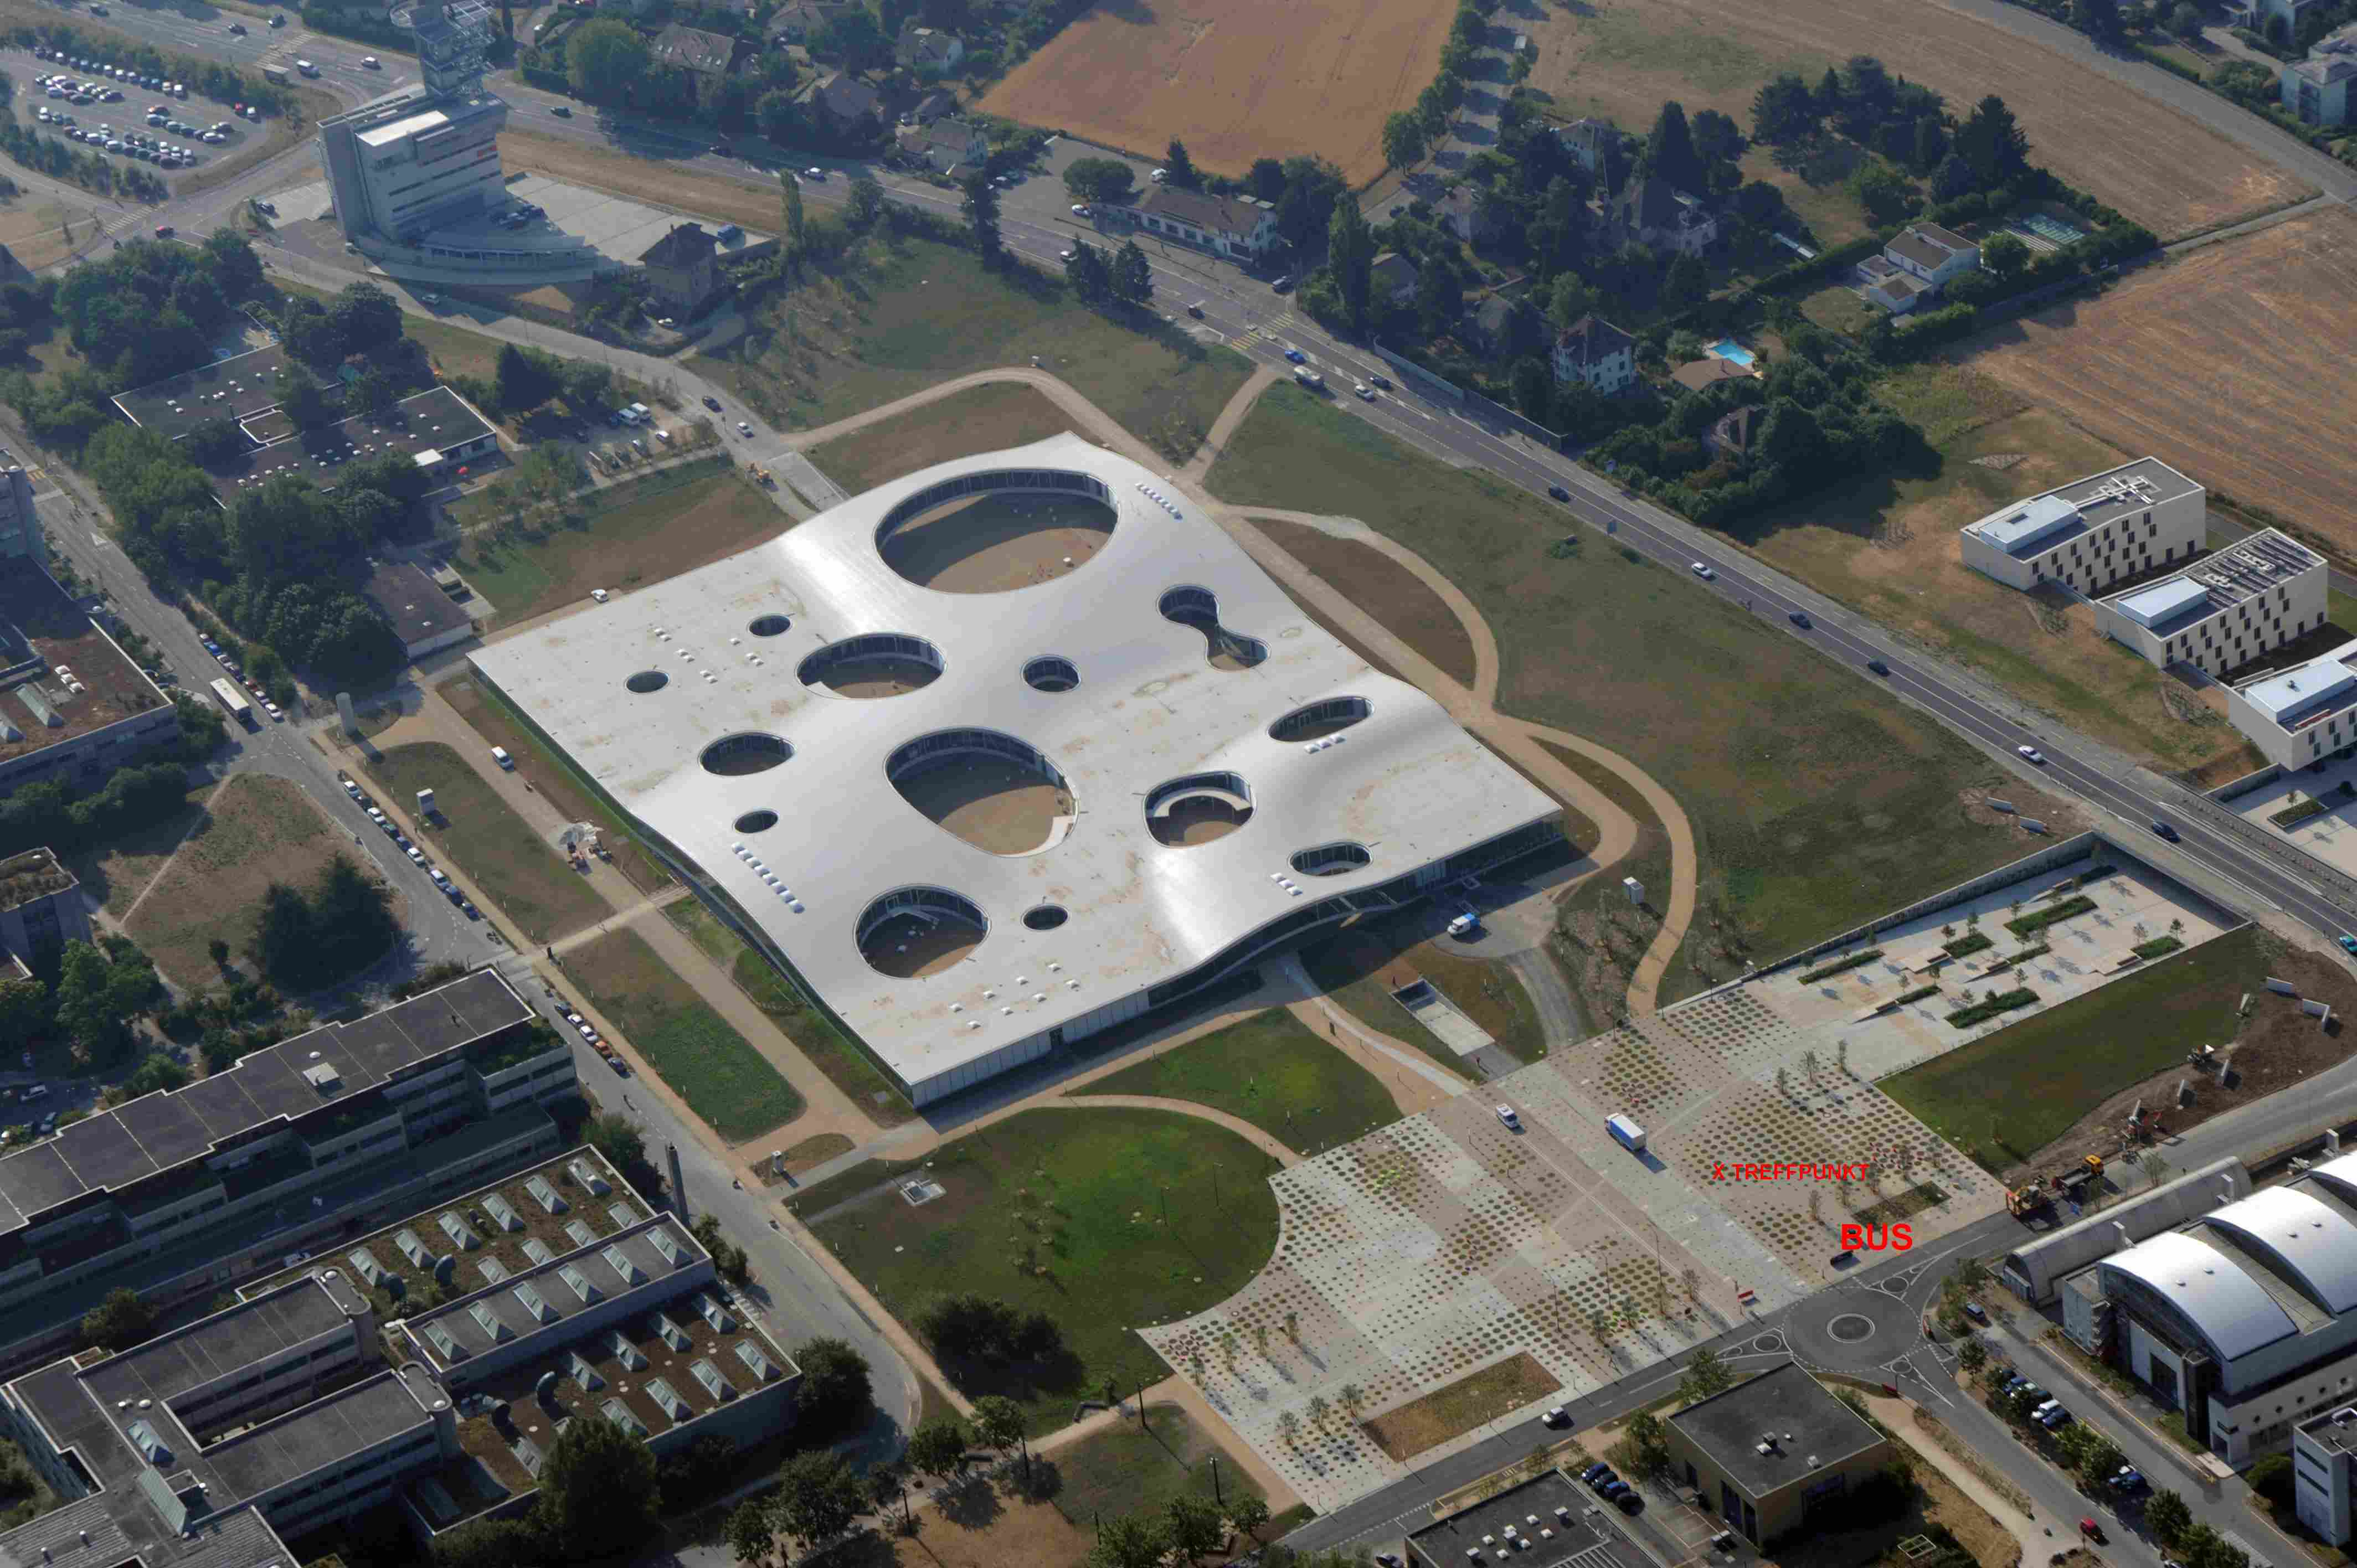 Rolex-learning-center_Treffpunkt-West